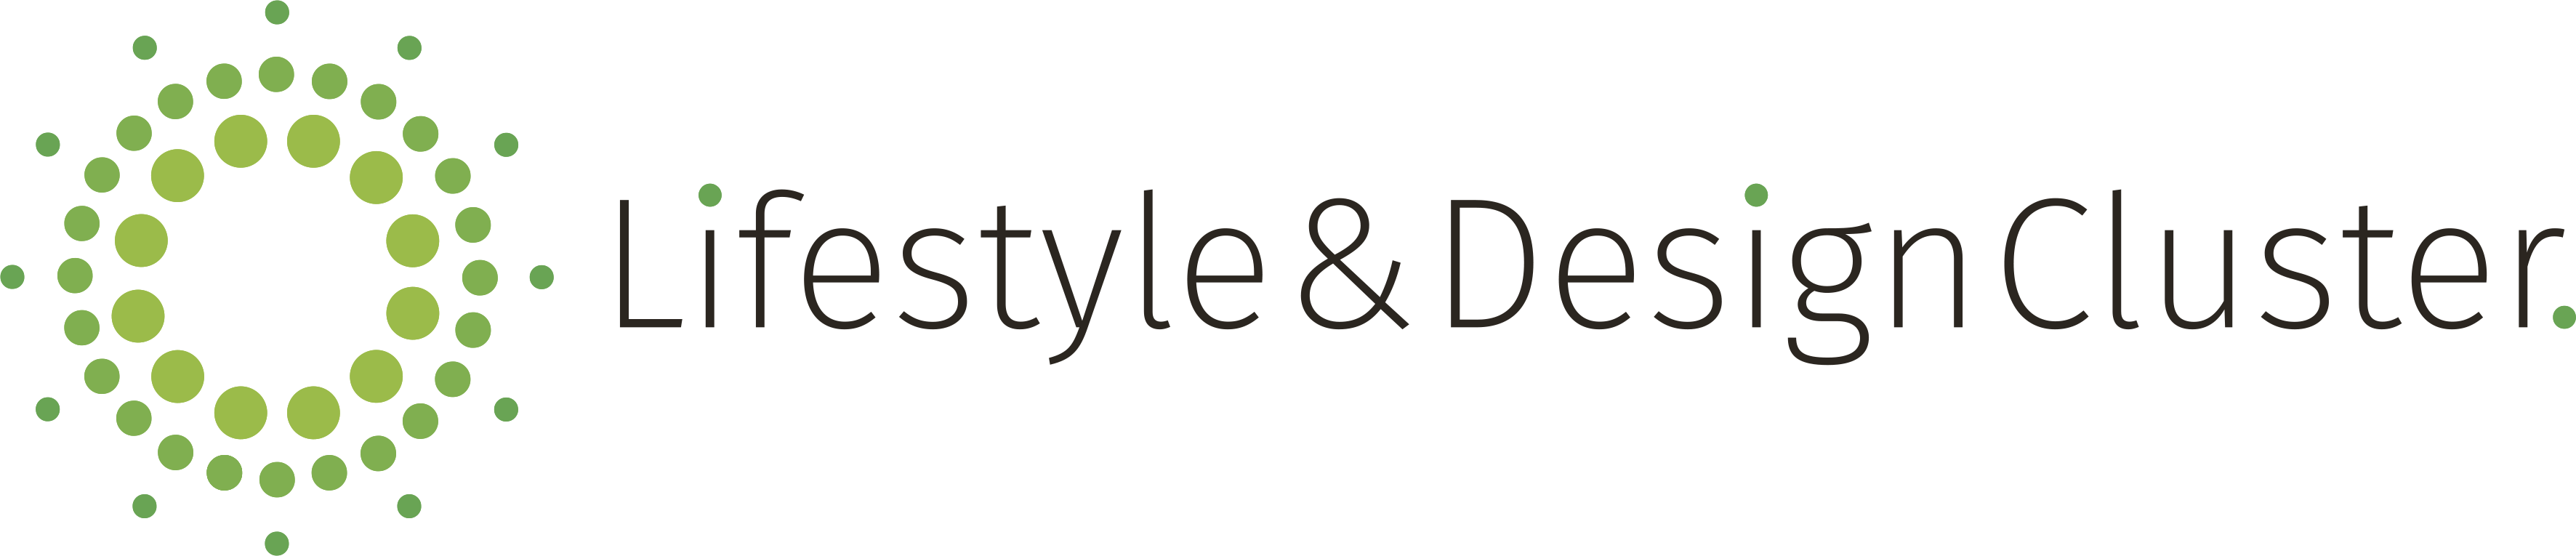 Lifestyle&designcluster – Positiv